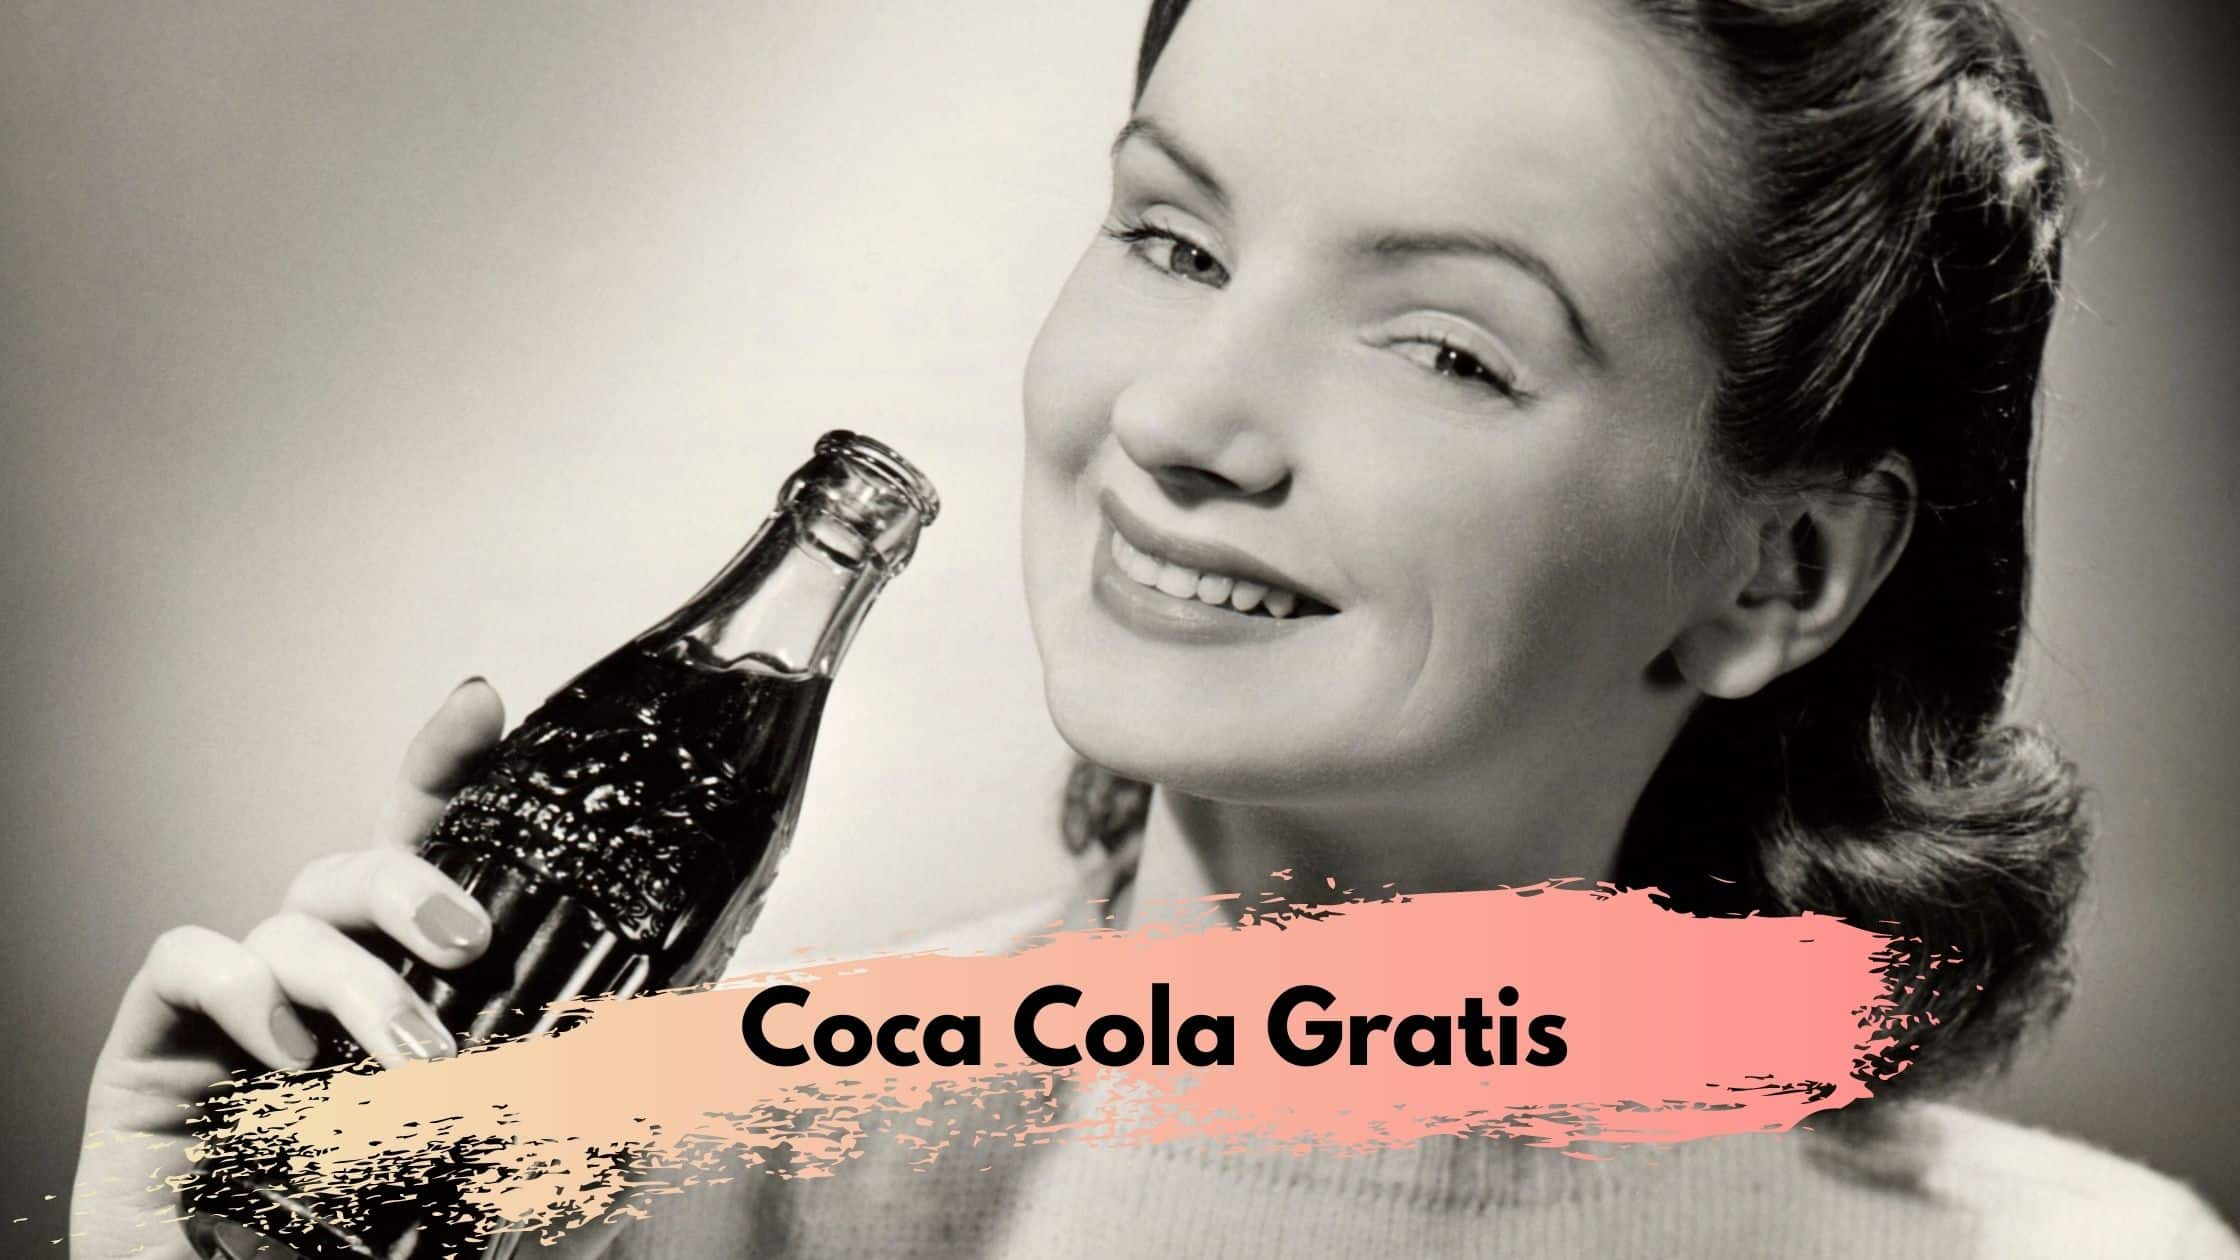 Coca Cola Gratis